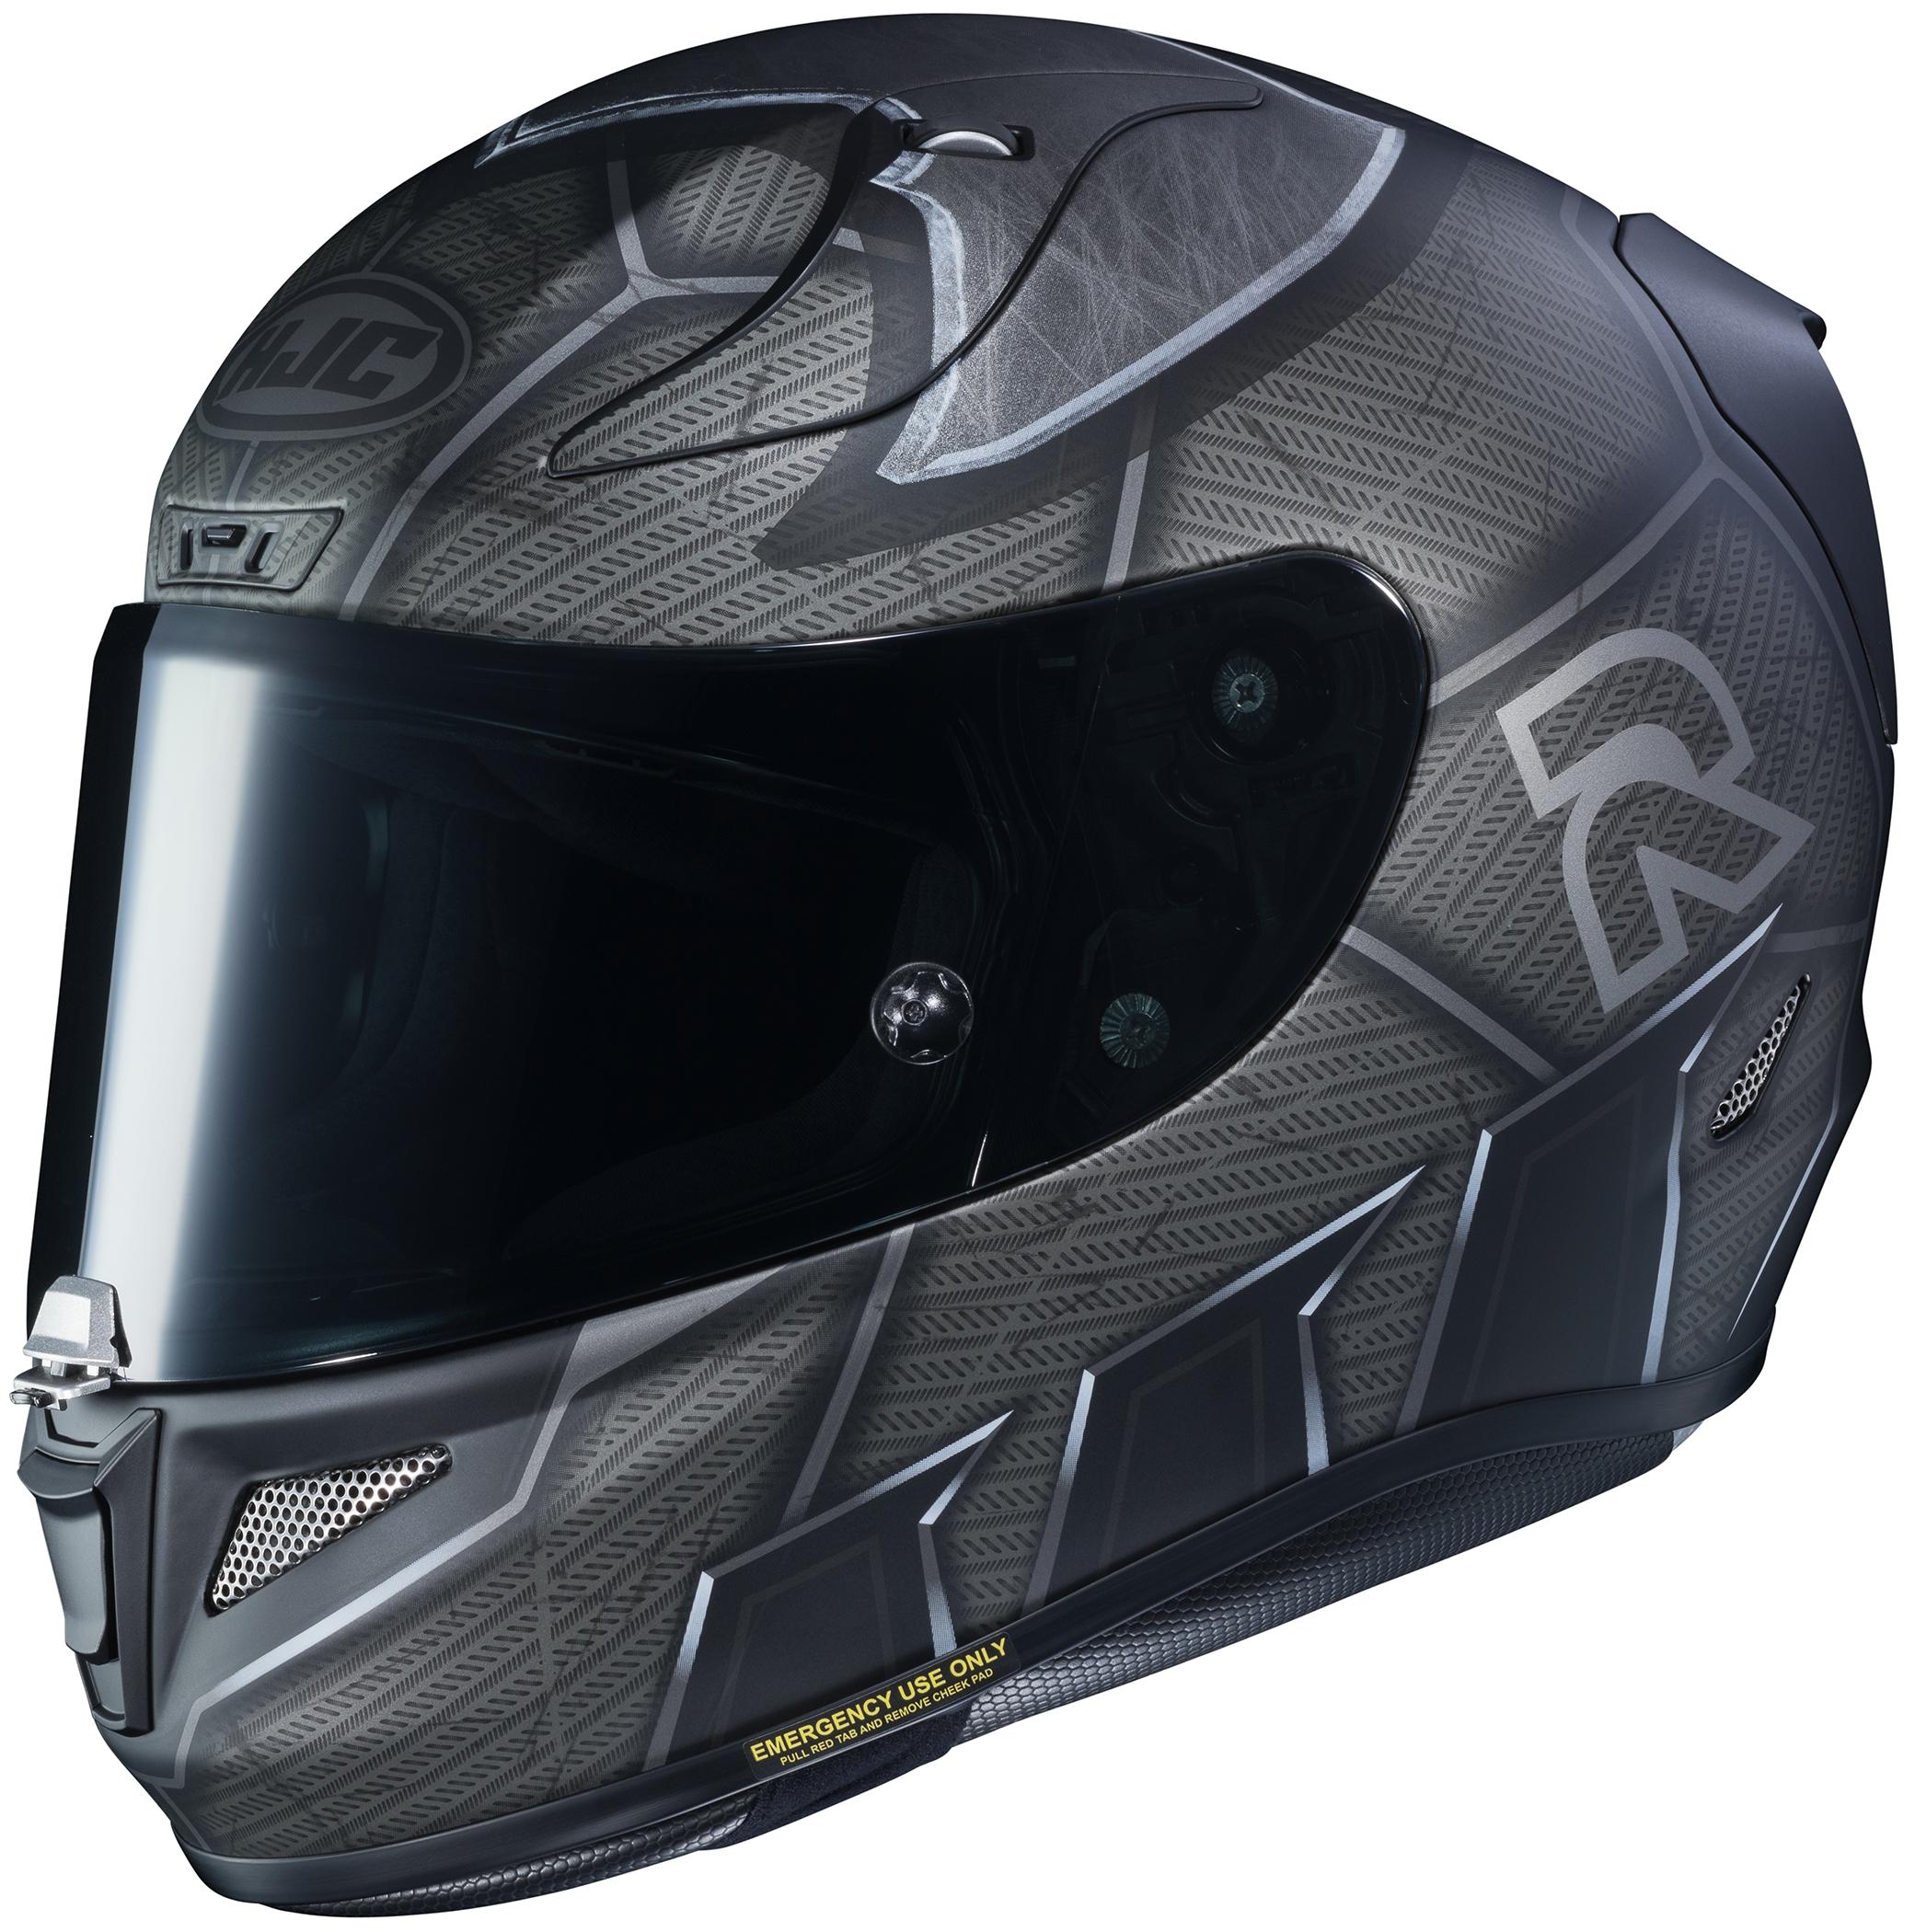 Batman helmet cover universal size